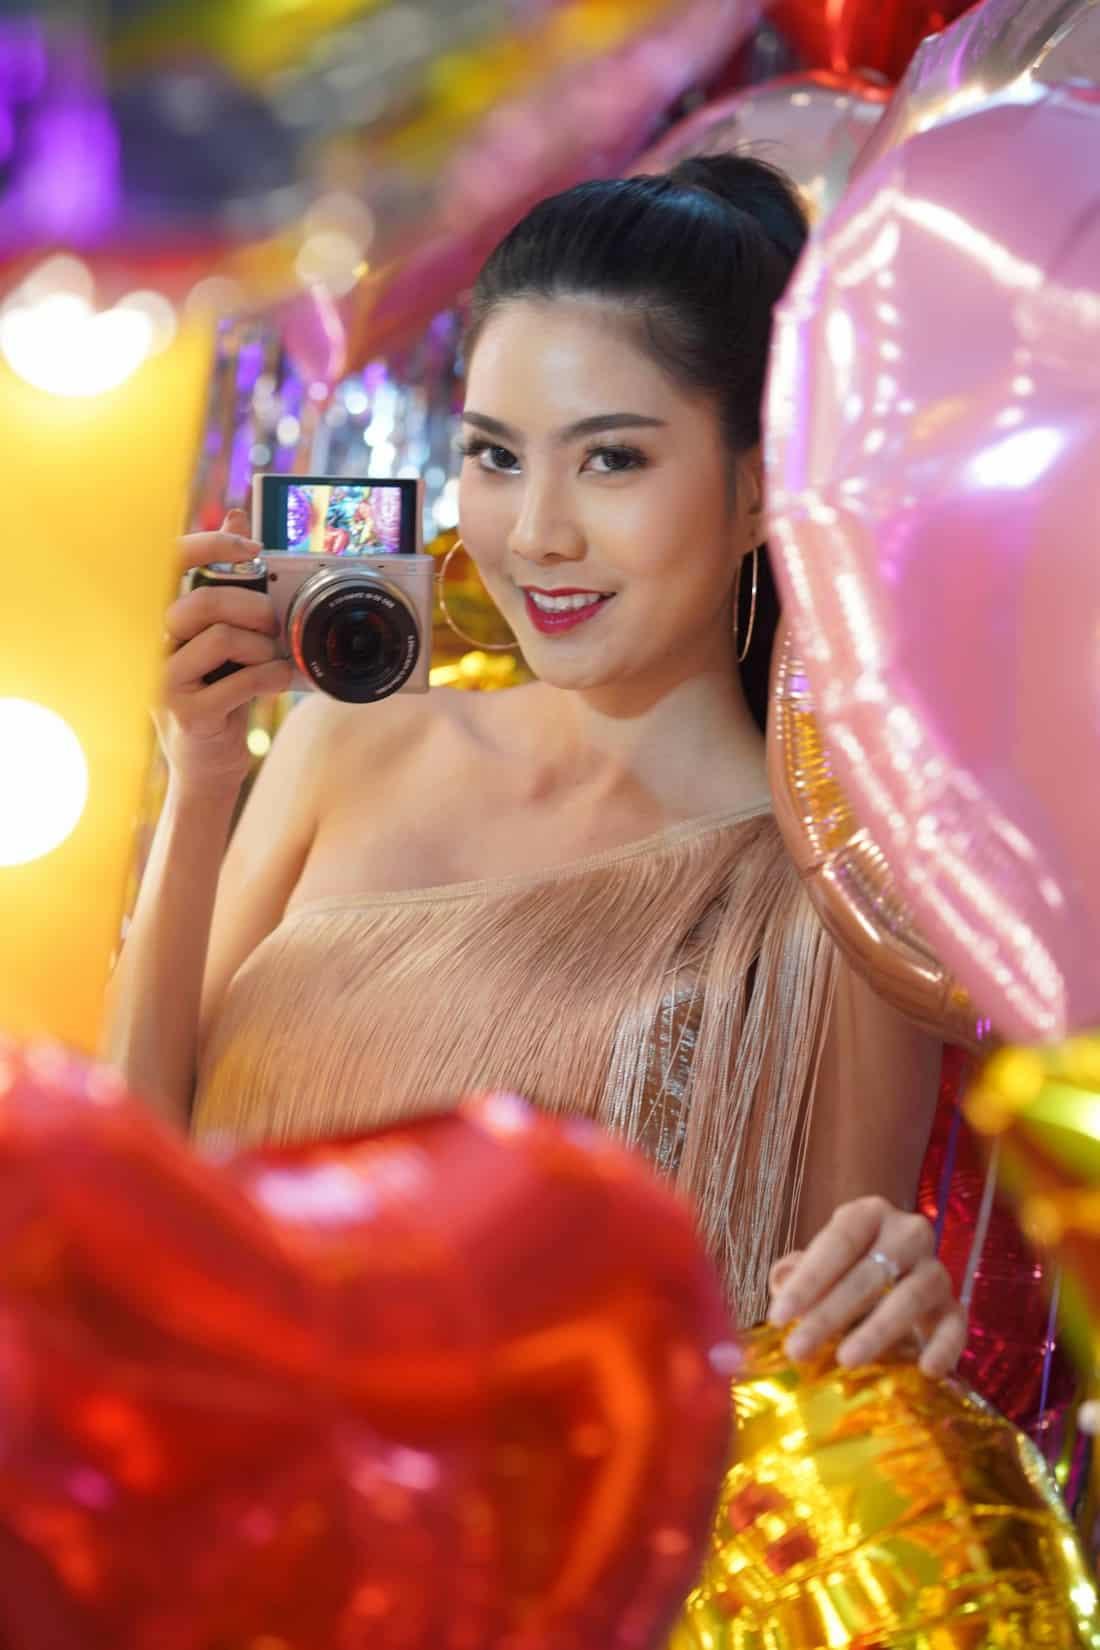 Pic SonyA6400 08 - Sony เปิดตัวกล้องอัลฟ่ามิเรอร์เลส α6400 (A6400) ราคาเริ่มต้น 32,990 บาท